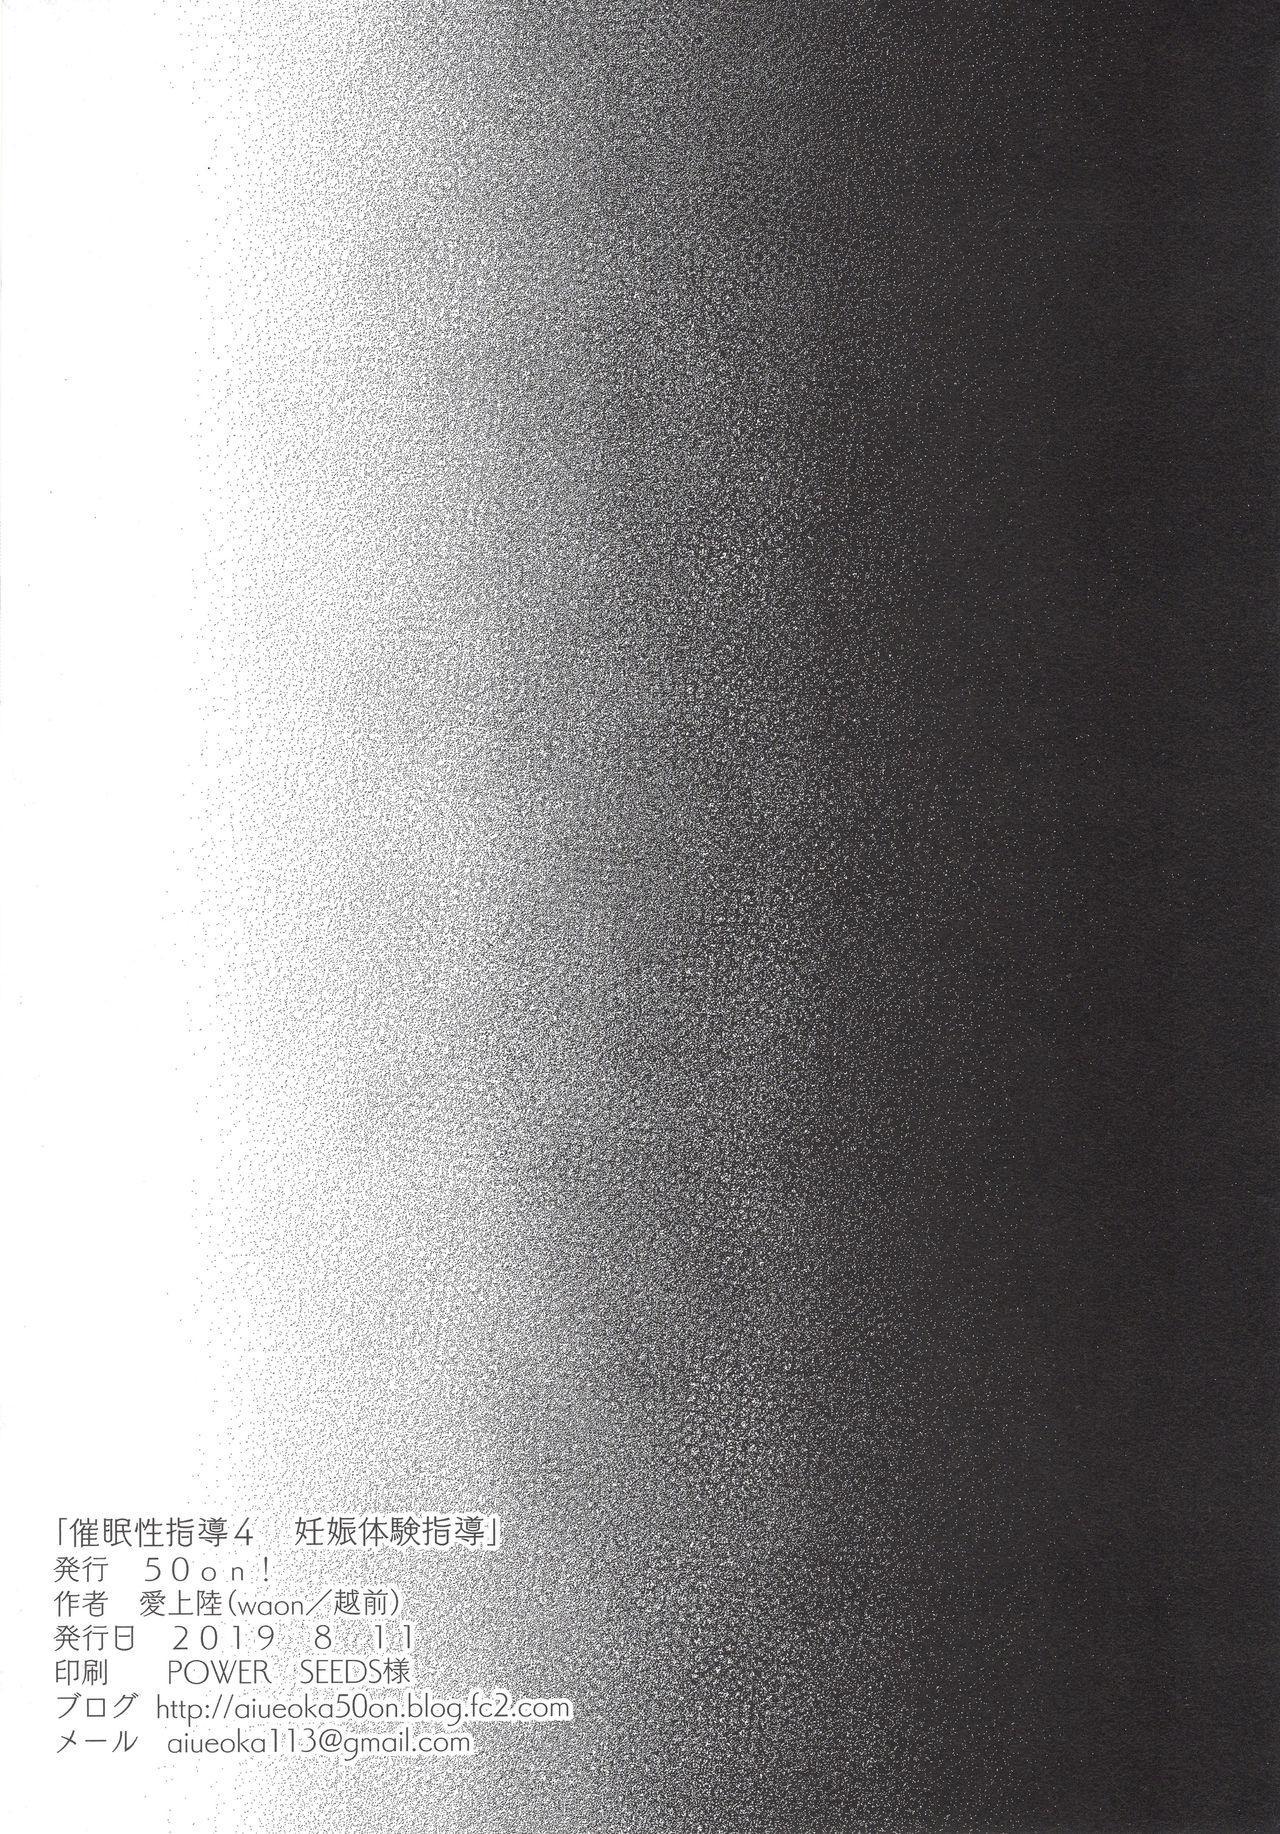 Saimin Seishidou 4: Ninshin Taiken Shidou 56